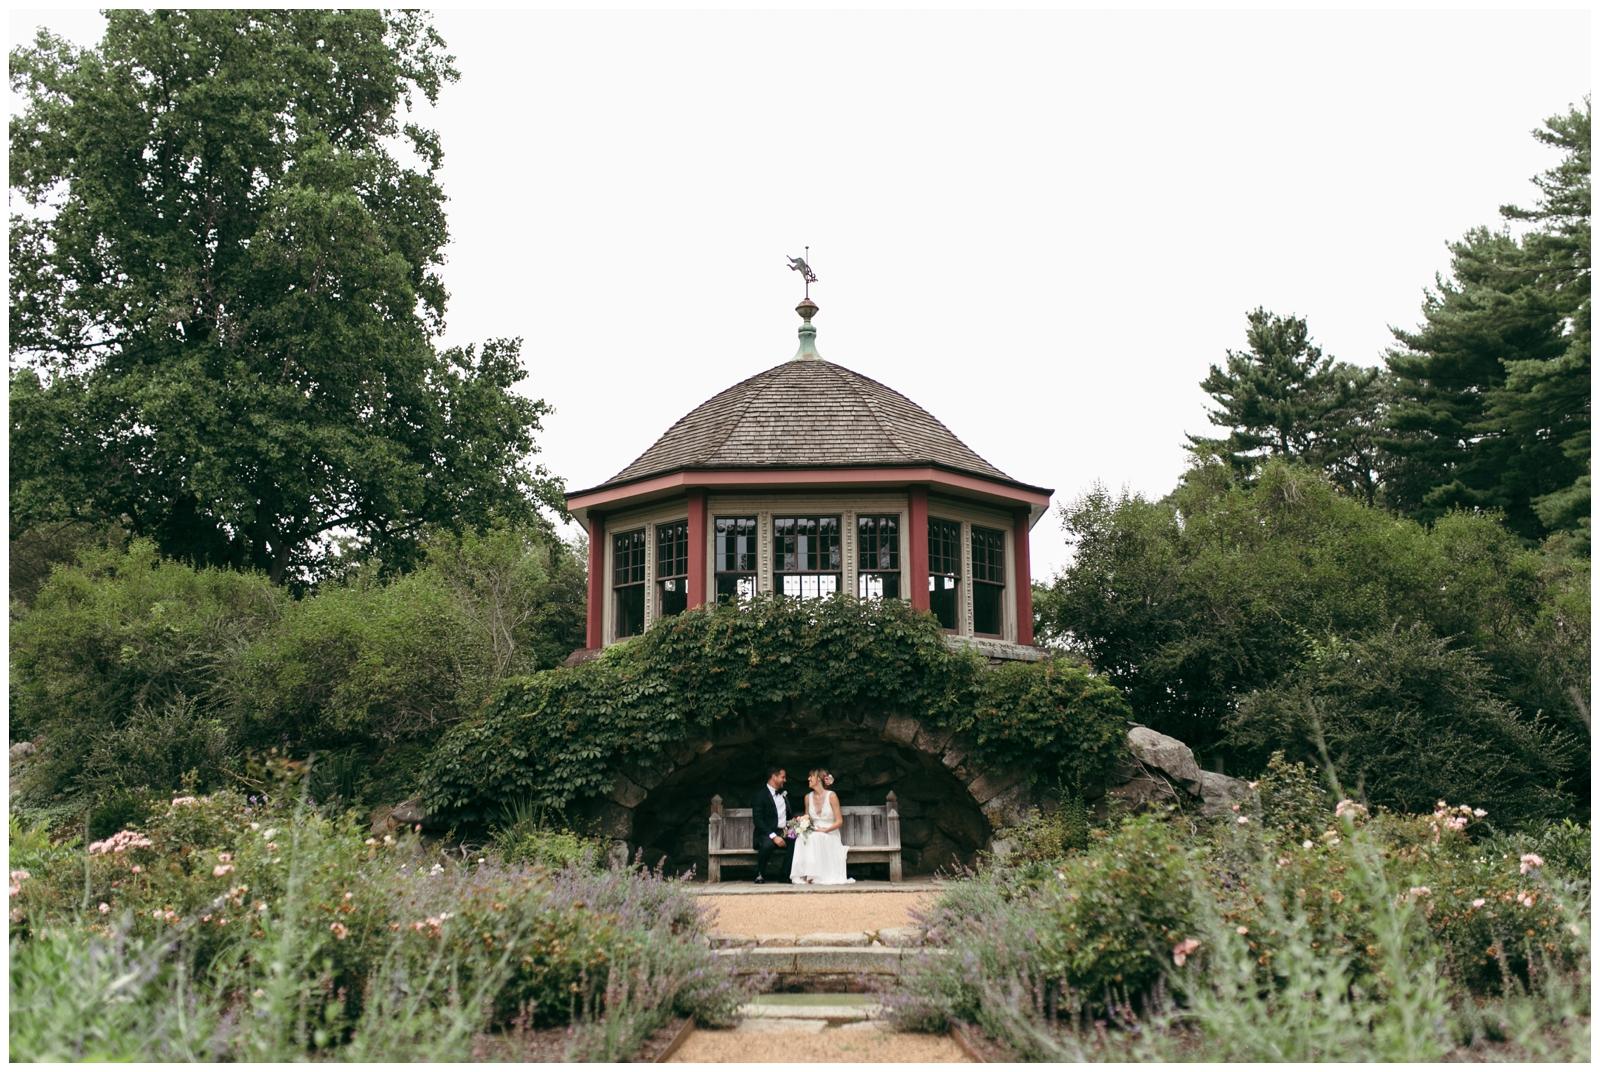 Moraine-Farm-wedding-Bailey-Q-Photo-Massachusetts-wedding-photpgrapher-024.jpg